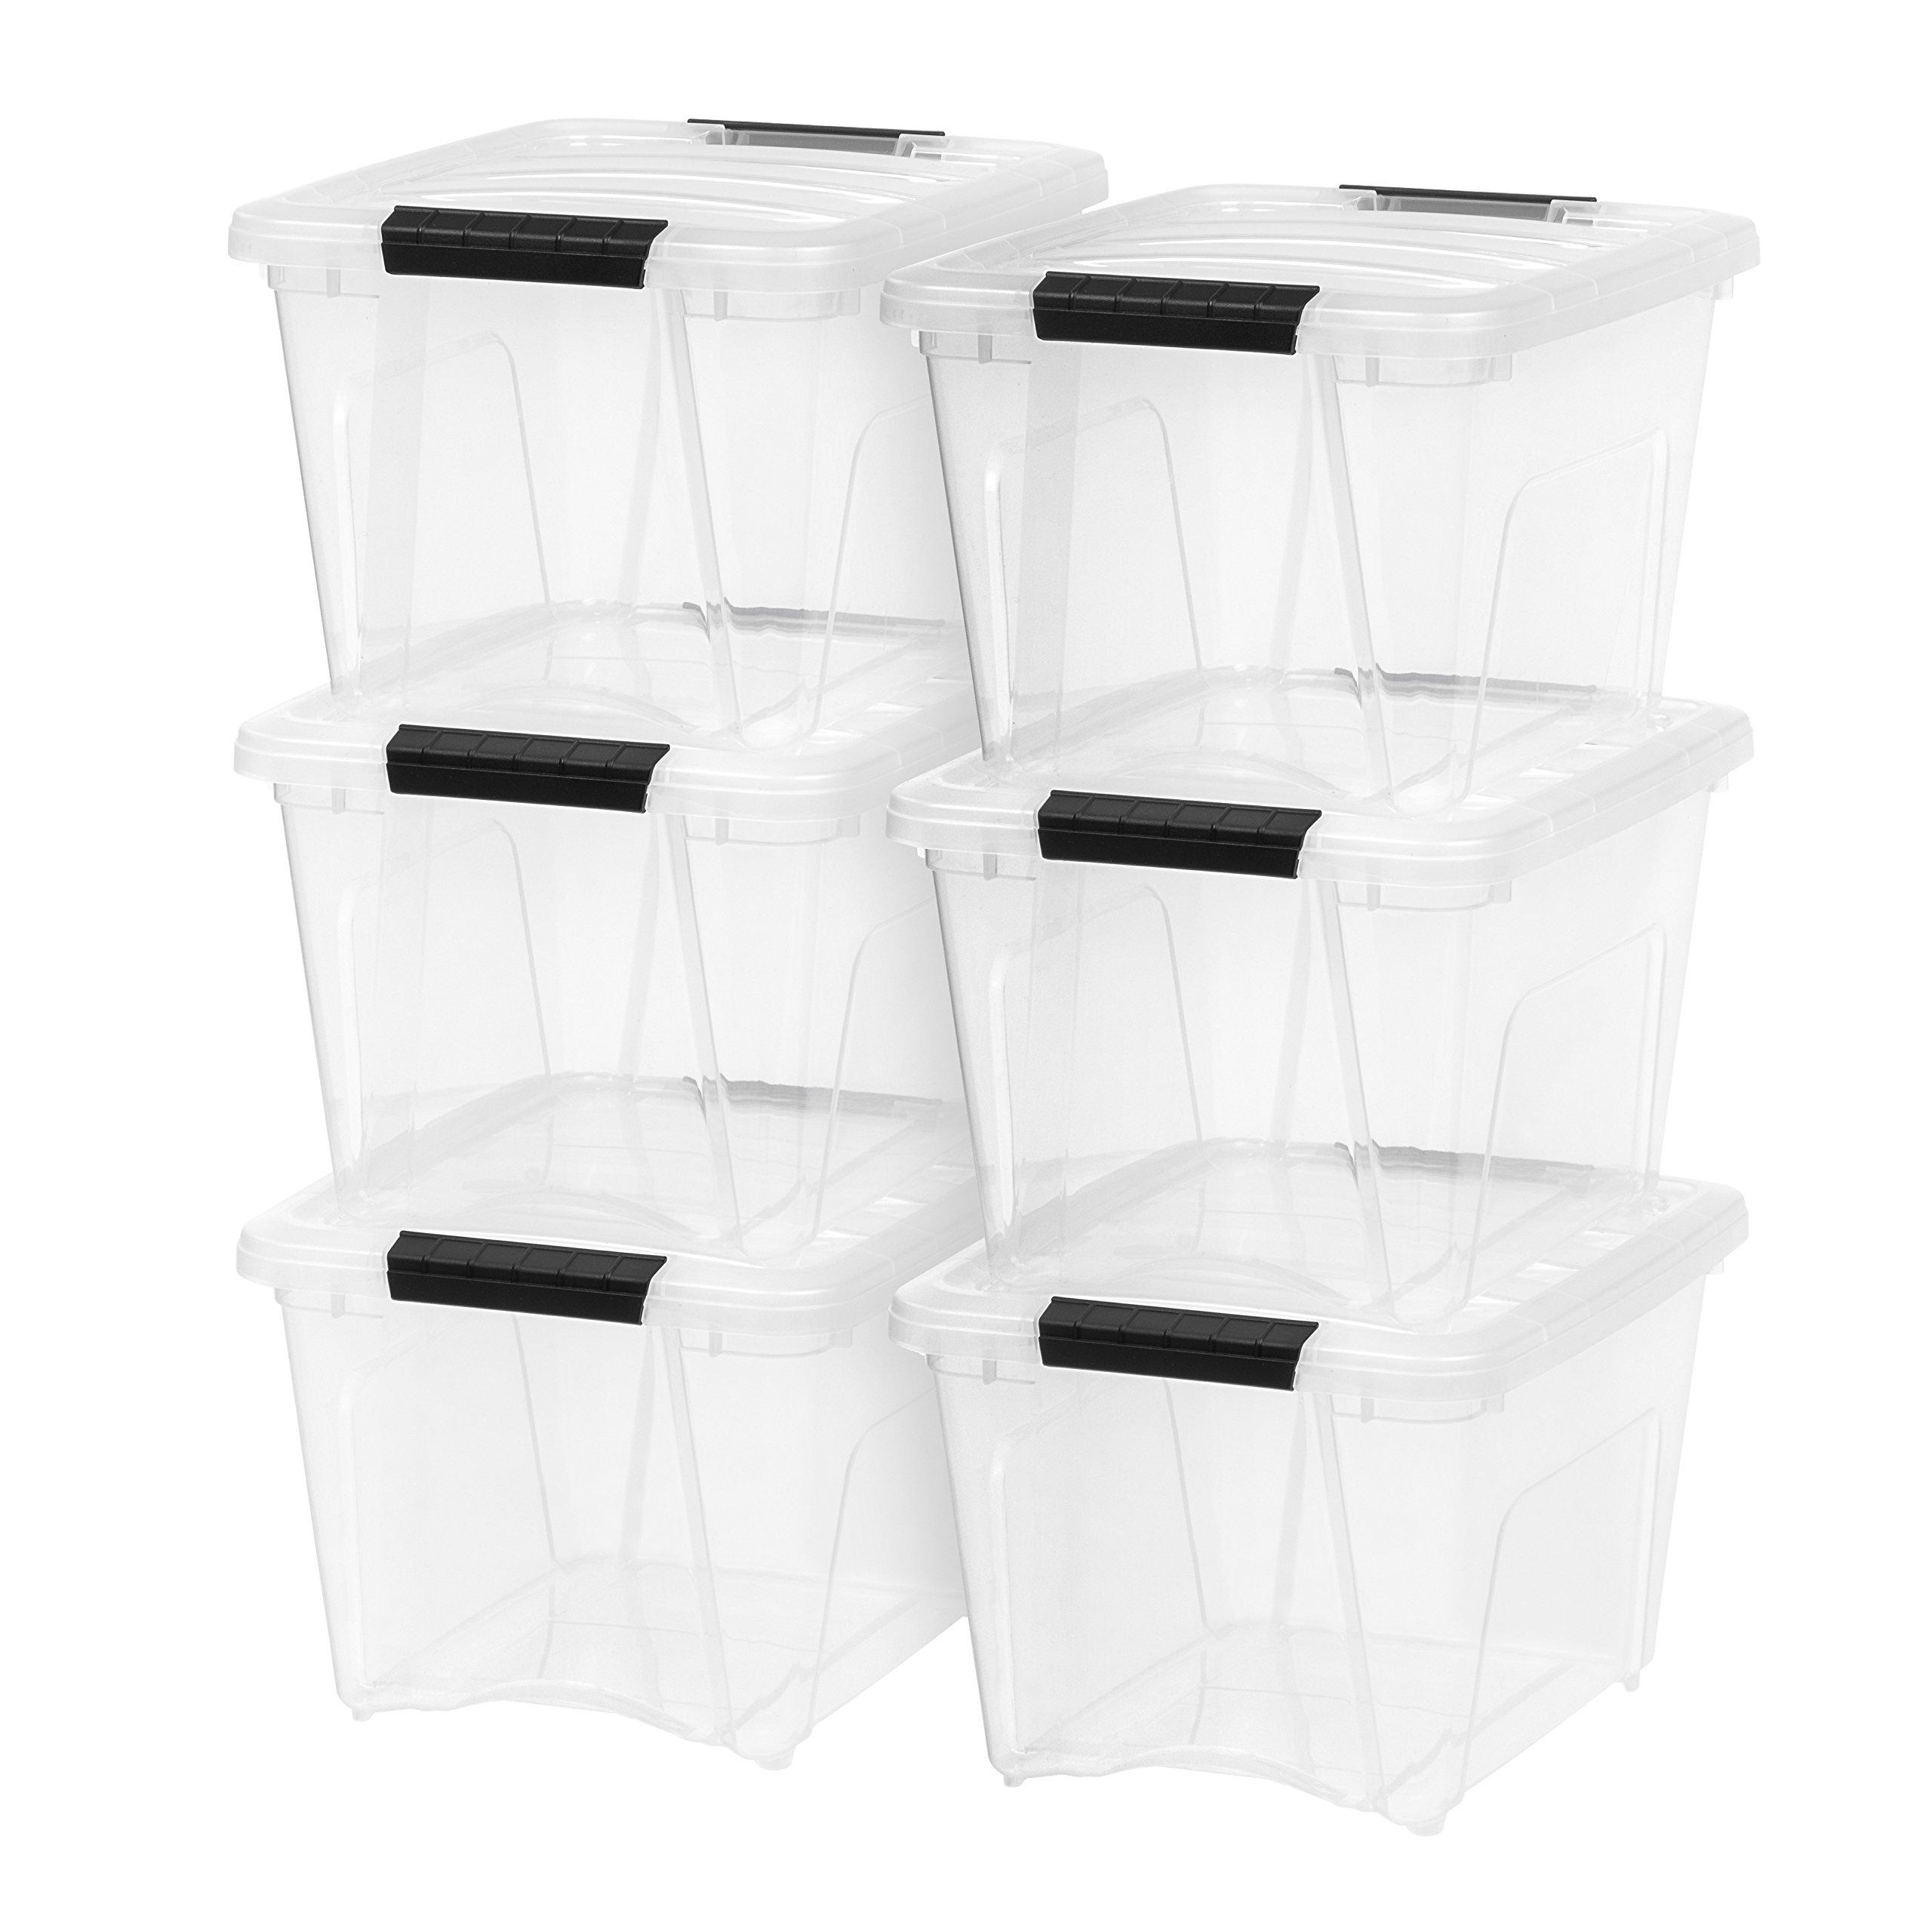 IRIS USA, Inc. TB-17 Stack & Pull Box, 19 Quart, Clear, 6 Pack by IRIS USA, Inc.